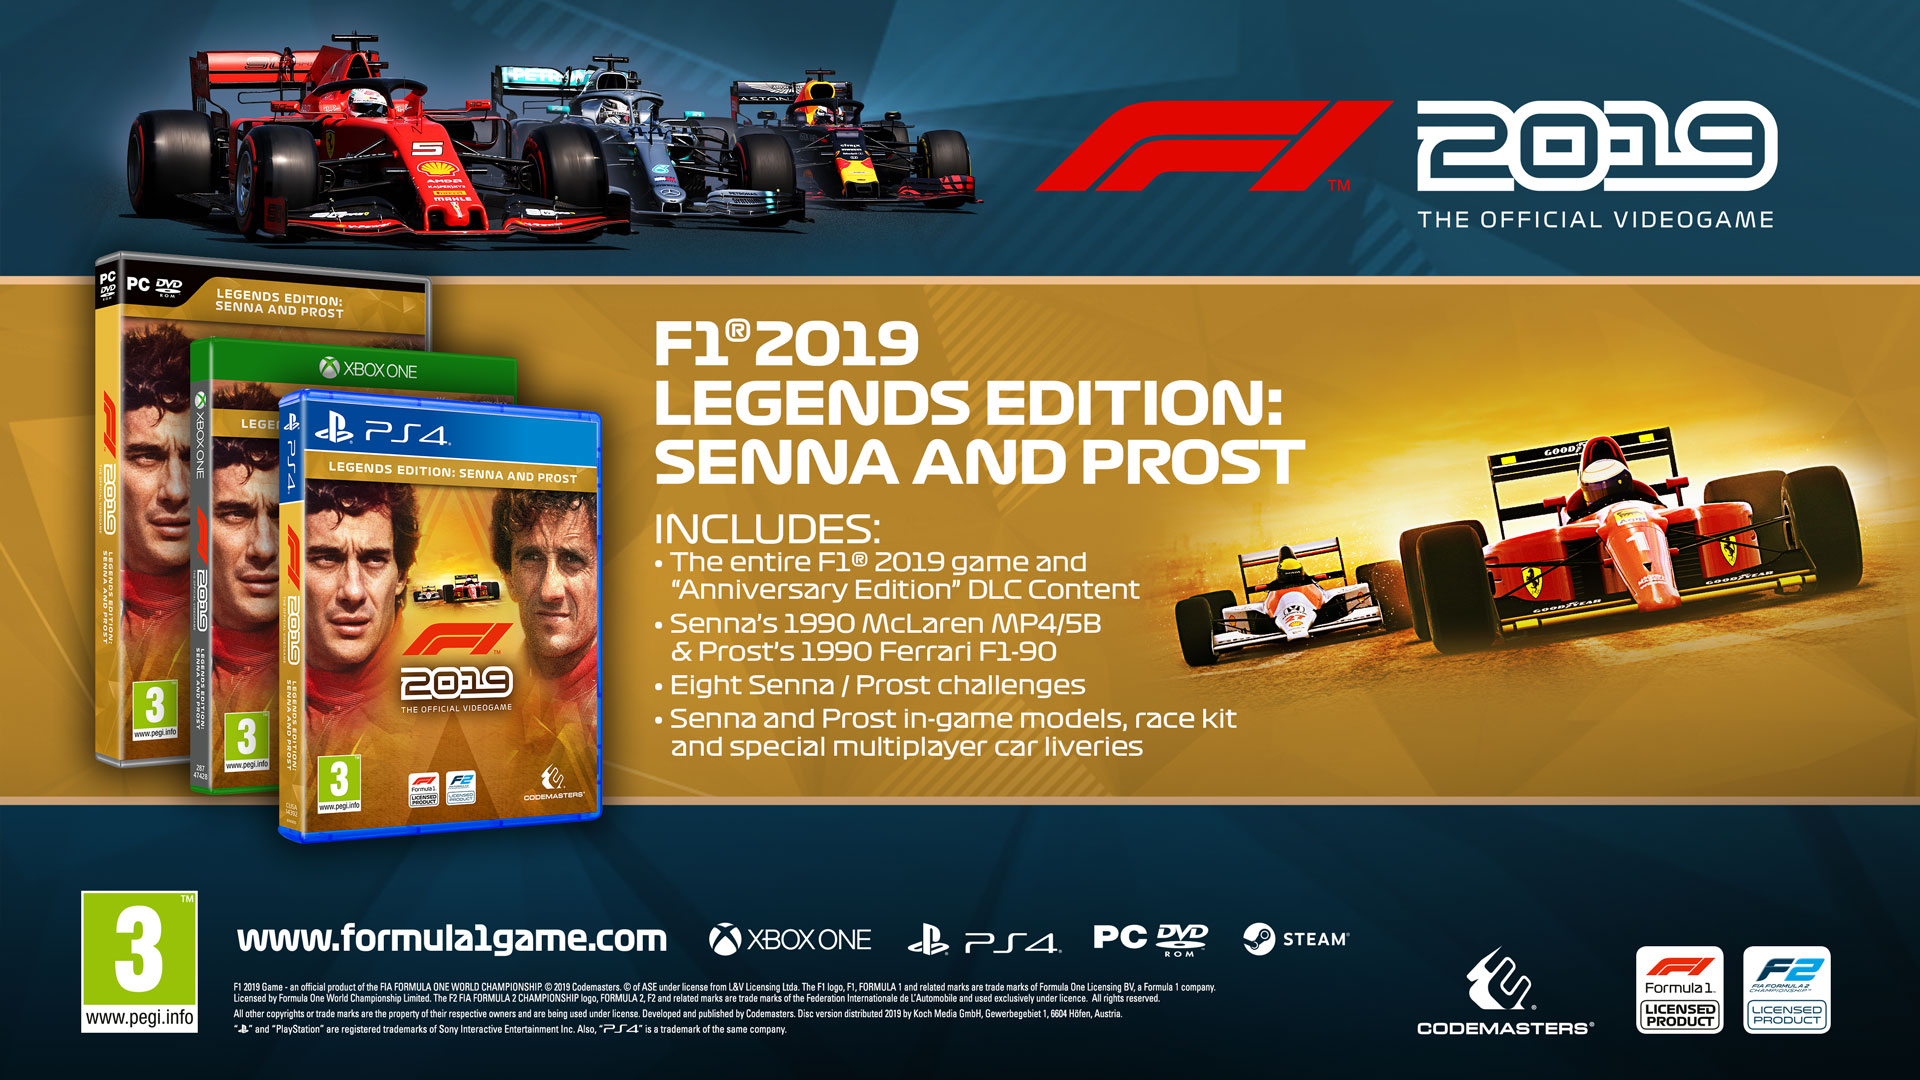 F1® 2019 Legends Edition | ROW (71690b30-5d03-49da-b534-305622bfd1a1)